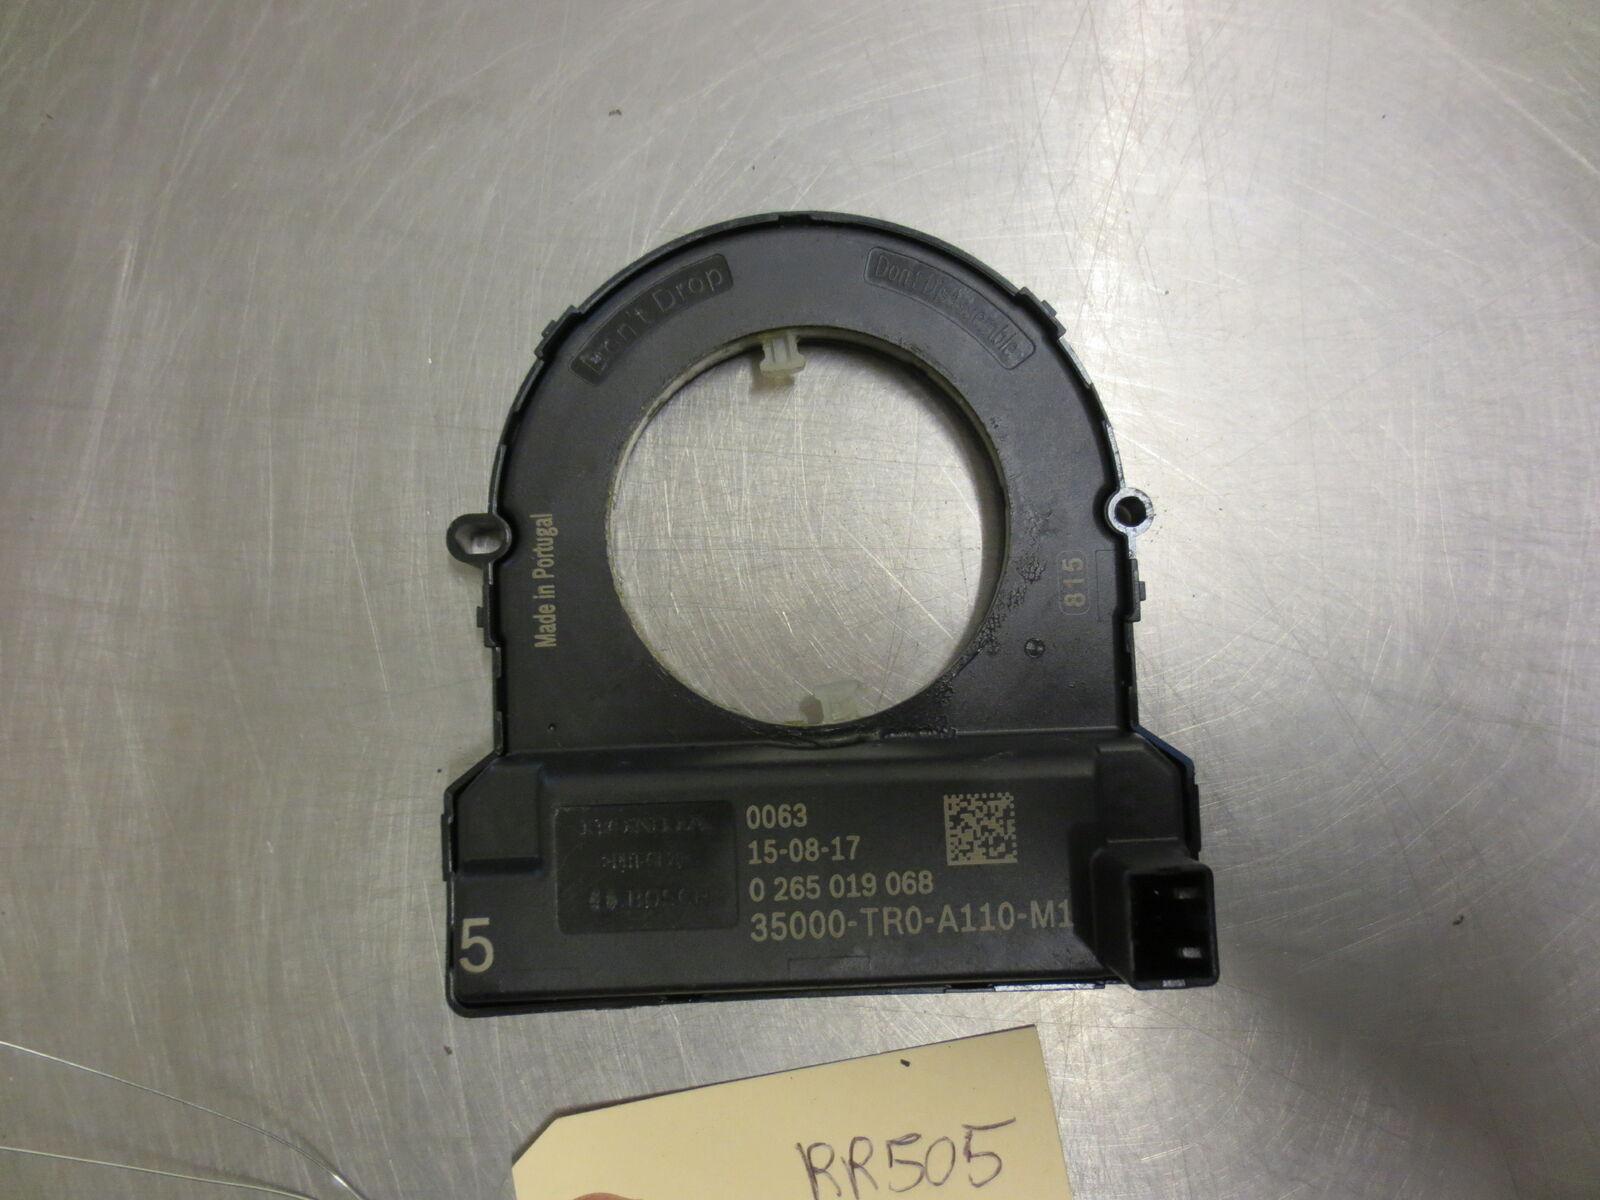 GRR505 Steering Angle Sensor 2015 Honda Civic 1.8 35000TR0A110 - $70.00